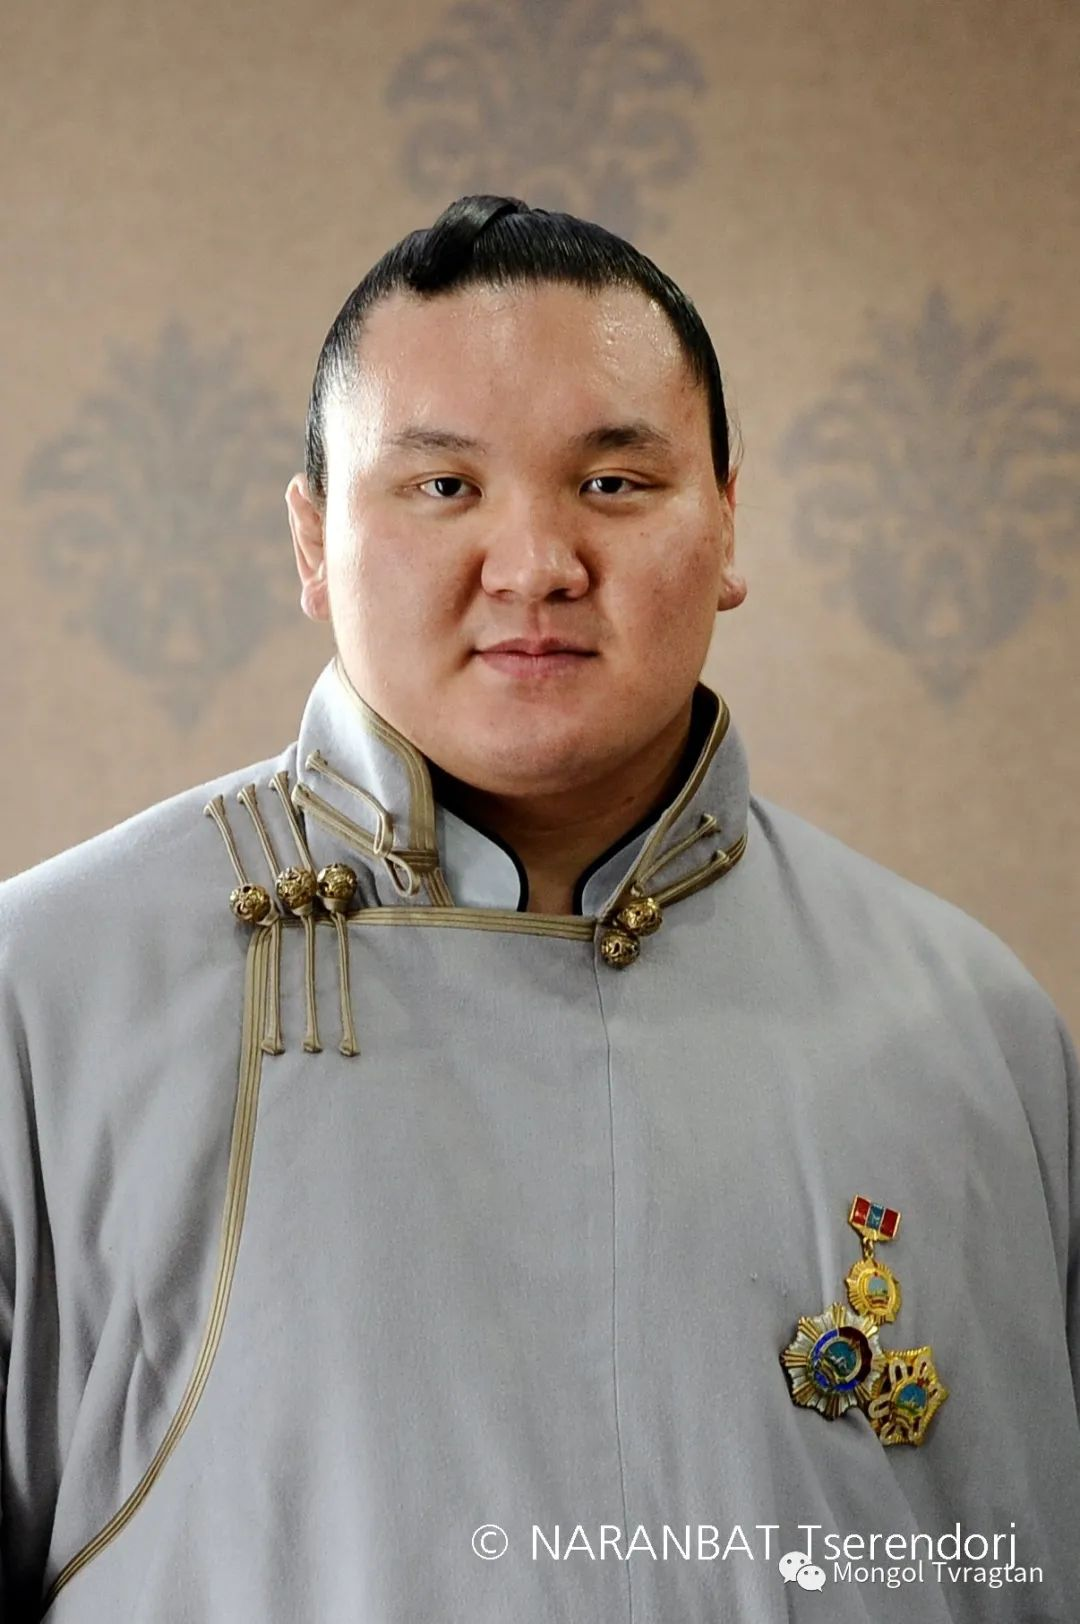 ᠮᠣᠩᠭᠤᠯ ᠰᠡᠭᠦᠳᠡᠷ- ᠴ᠂ ᠨᠠᠷᠠᠨᠪᠠᠲᠤ 第10张 ᠮᠣᠩᠭᠤᠯ ᠰᠡᠭᠦᠳᠡᠷ- ᠴ᠂ ᠨᠠᠷᠠᠨᠪᠠᠲᠤ 蒙古文化